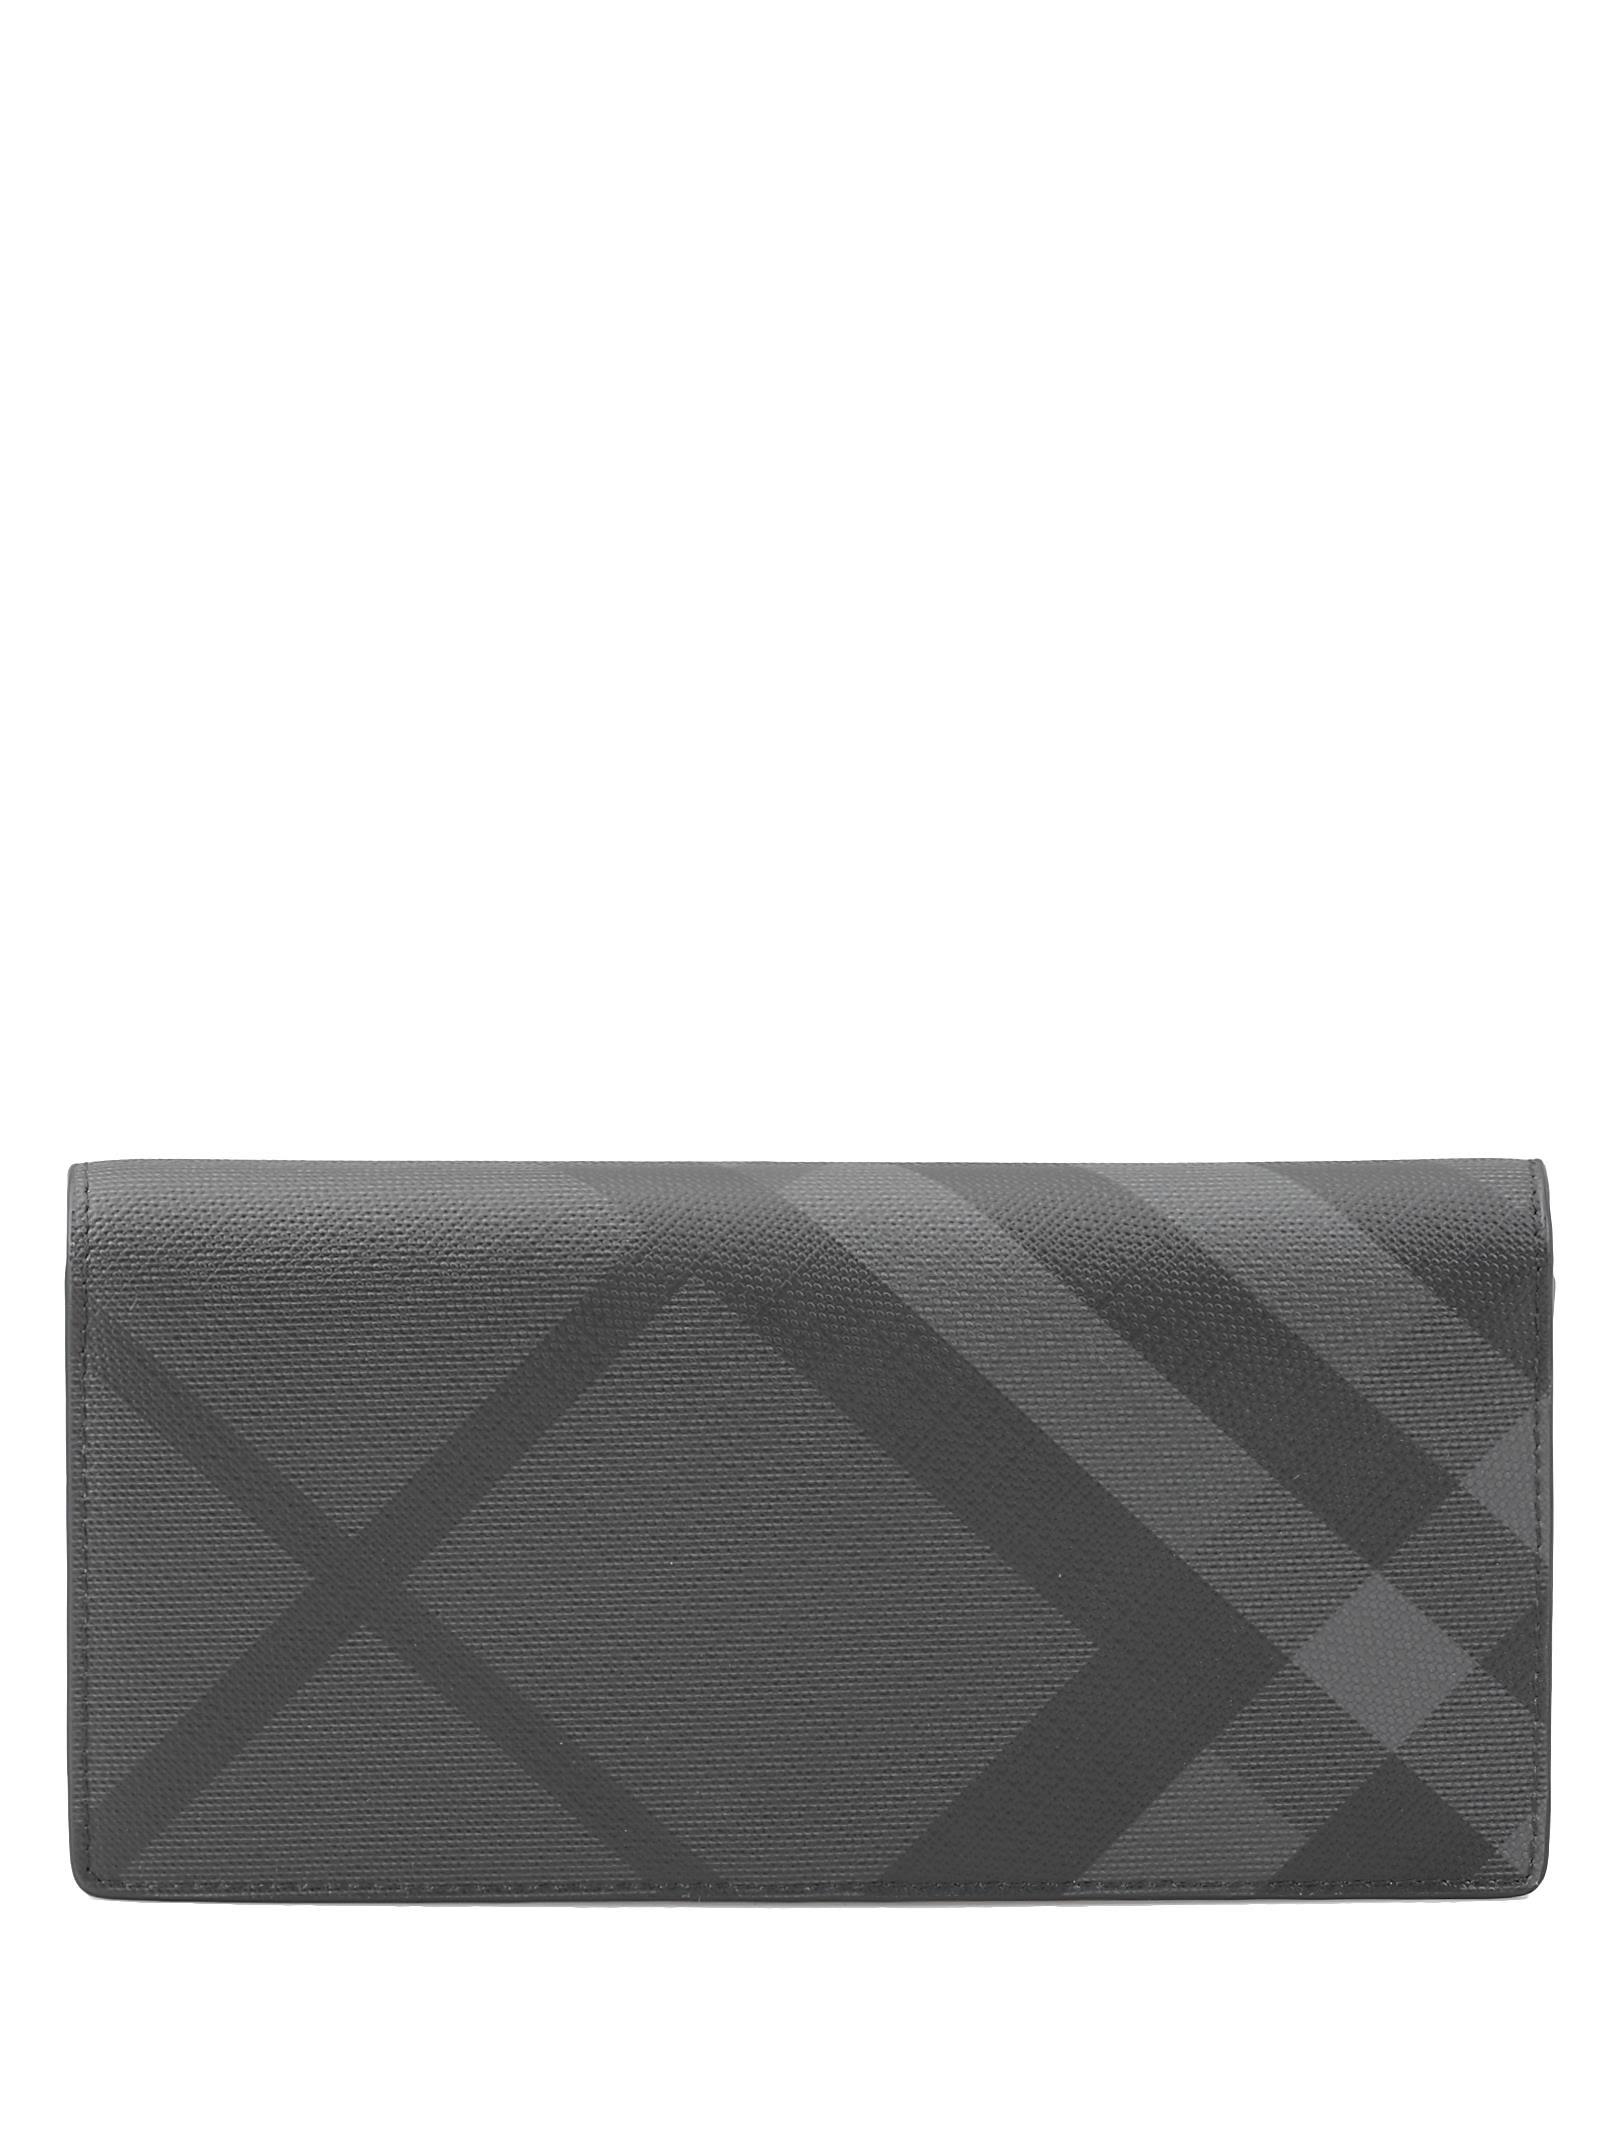 Burberry Cavendish Wallet